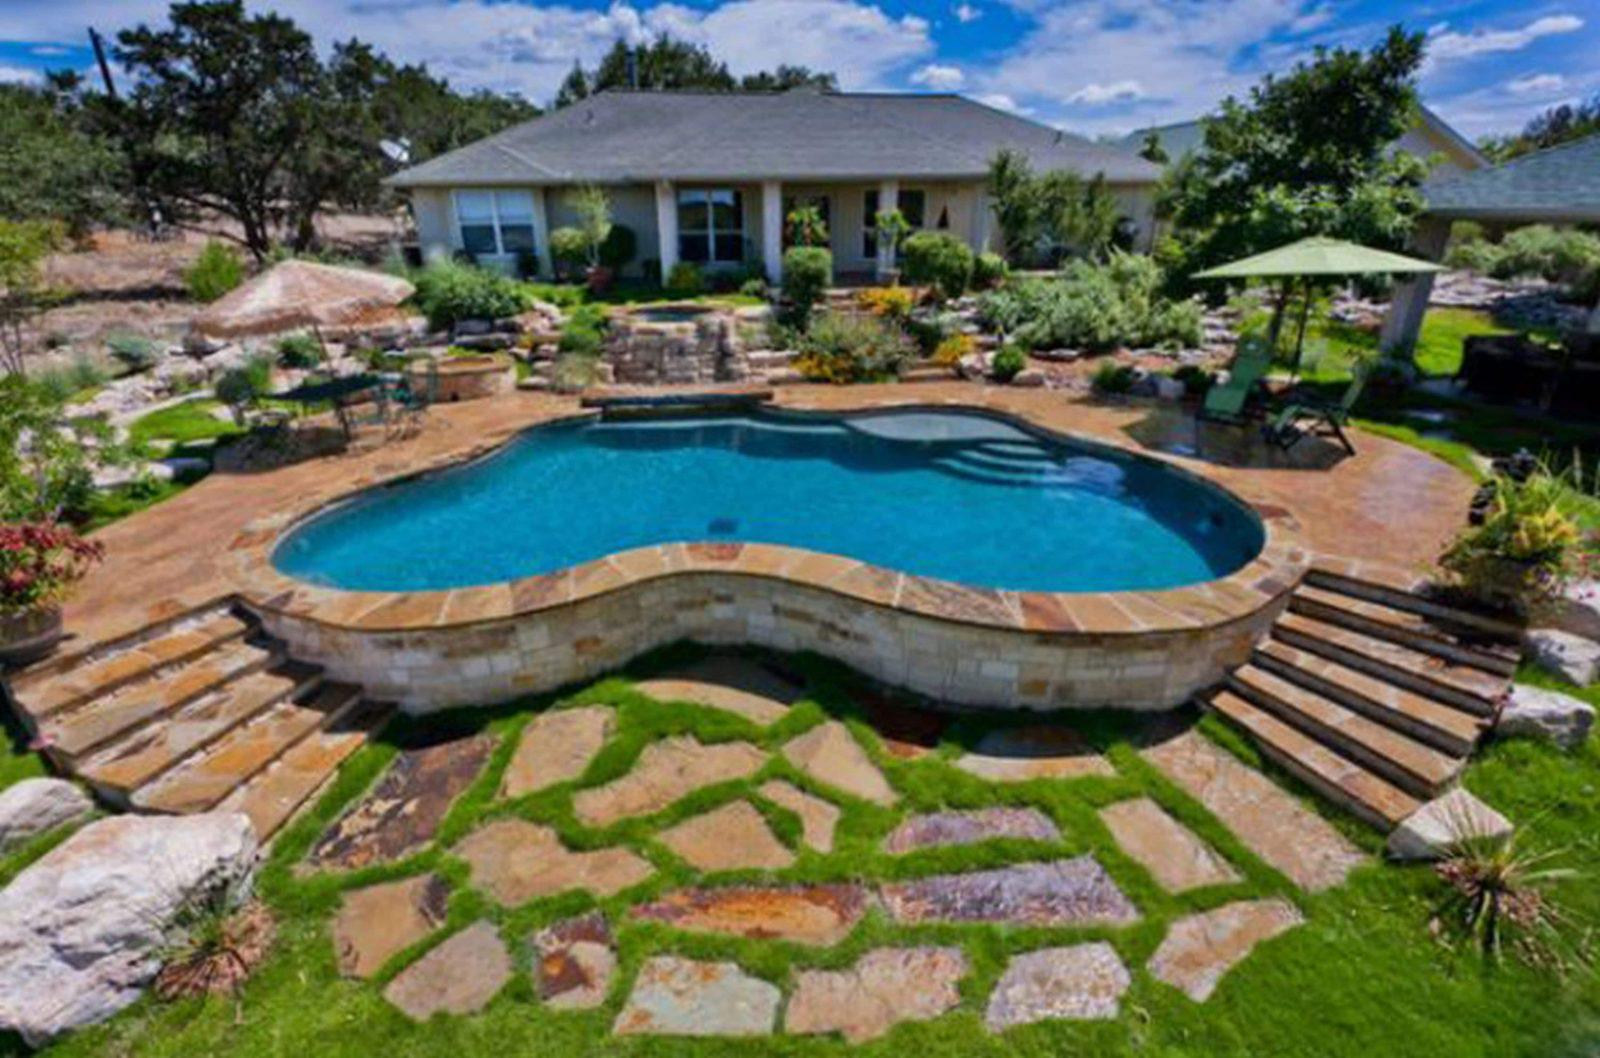 20 Amazing Backyard Pool Designs - YardMasterz.com on Modern Backyard Ideas With Pool id=31313